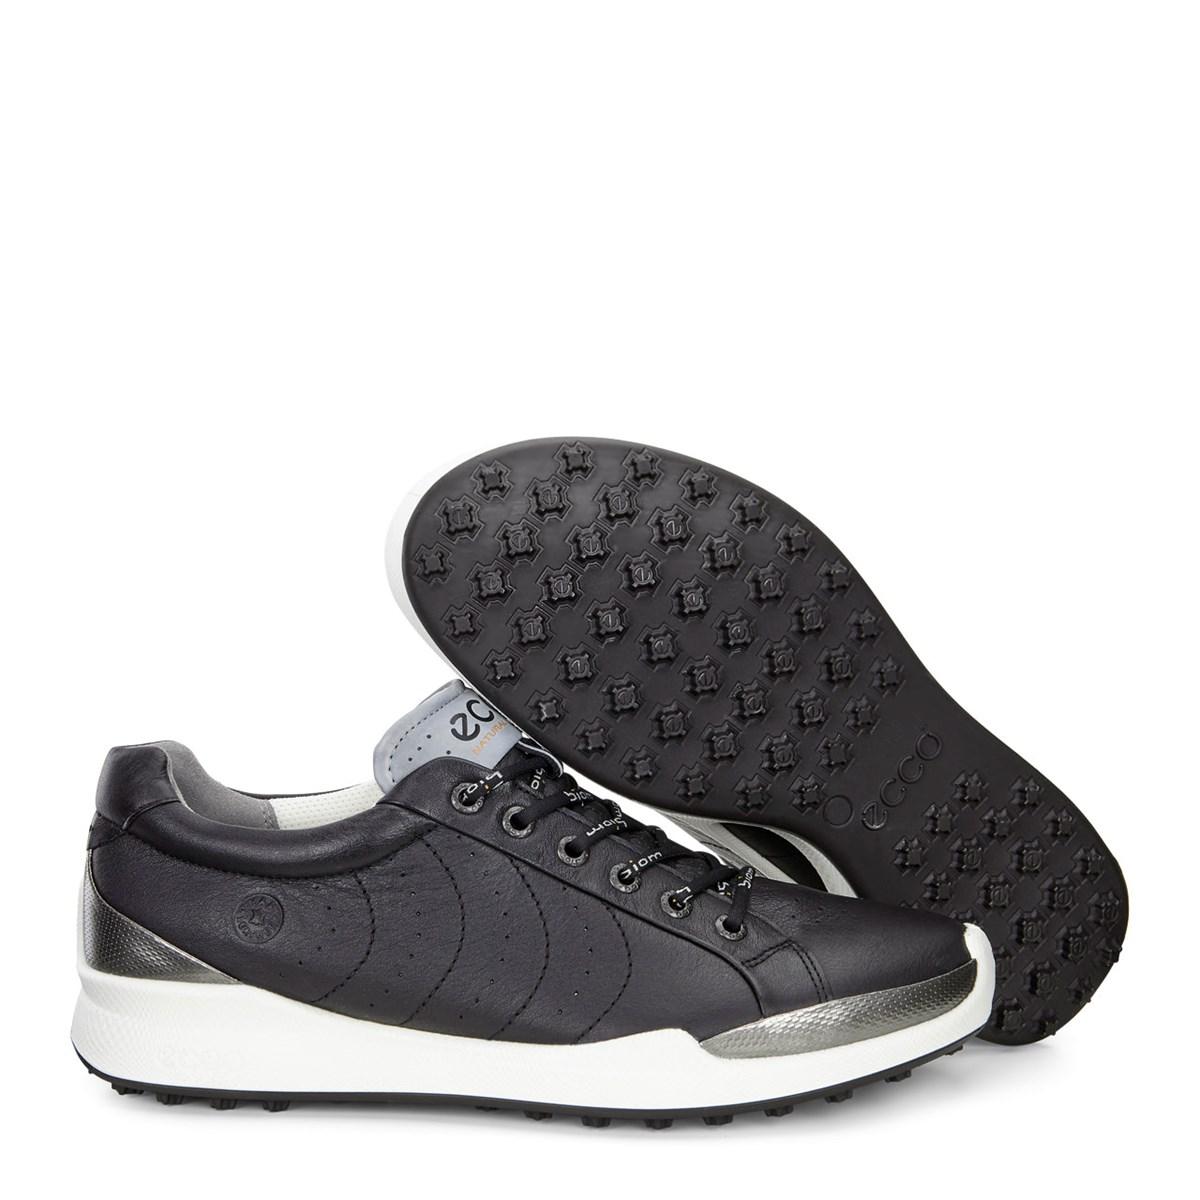 ed52152f25 Shop Mens - M.GOLF BIOM HYBRID - ECCO Shoes NZ